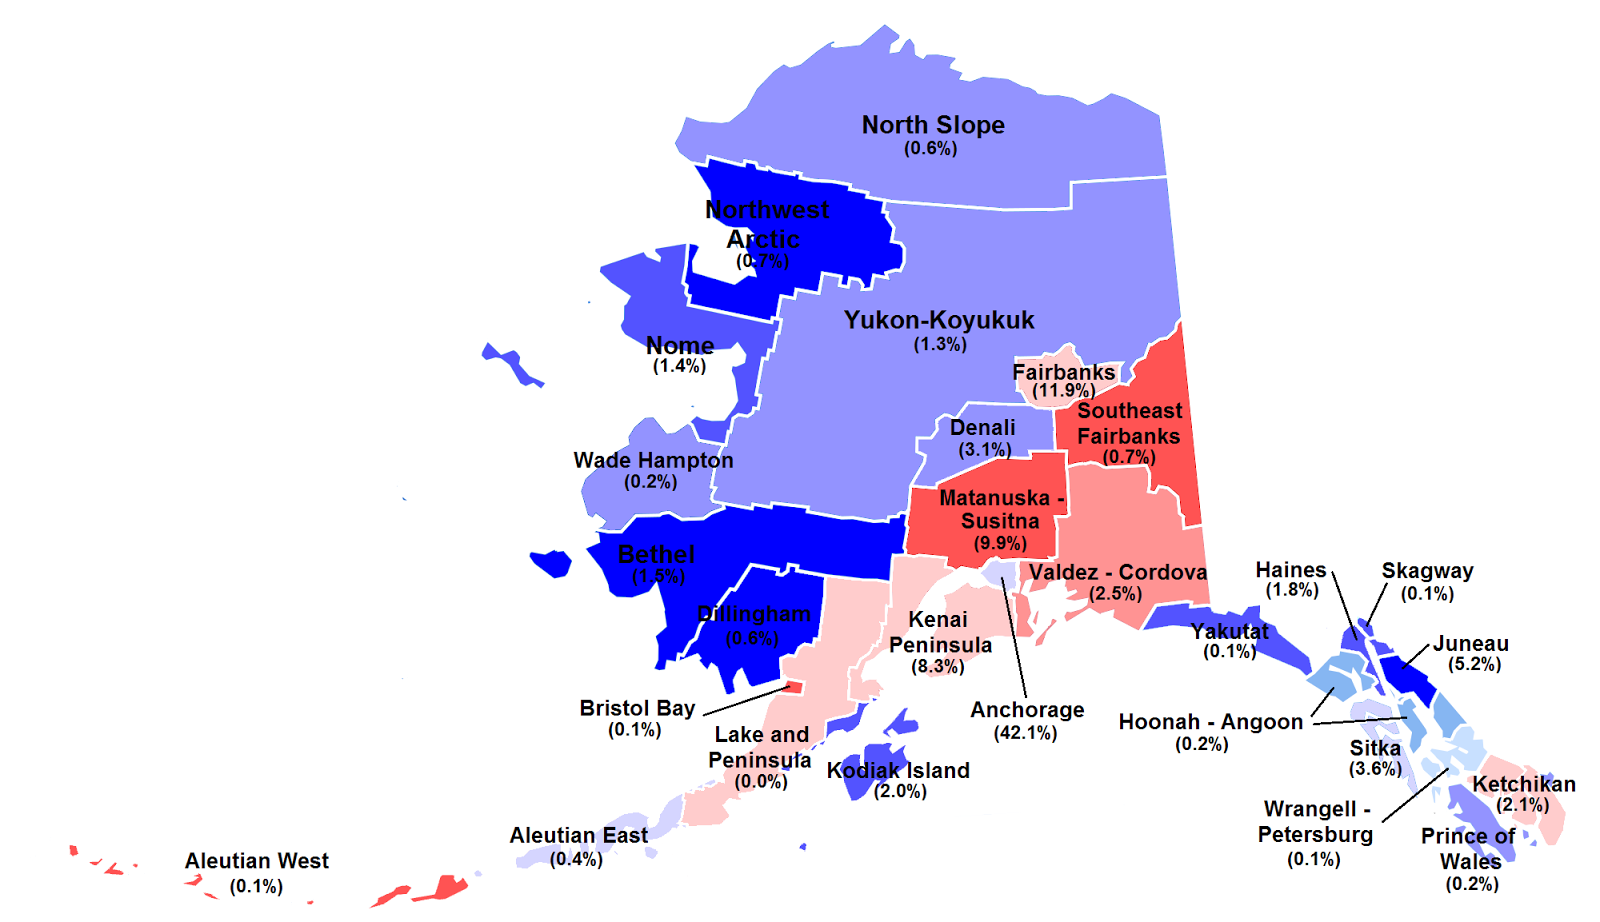 2008 alaska senate election by borough and percent of electorate